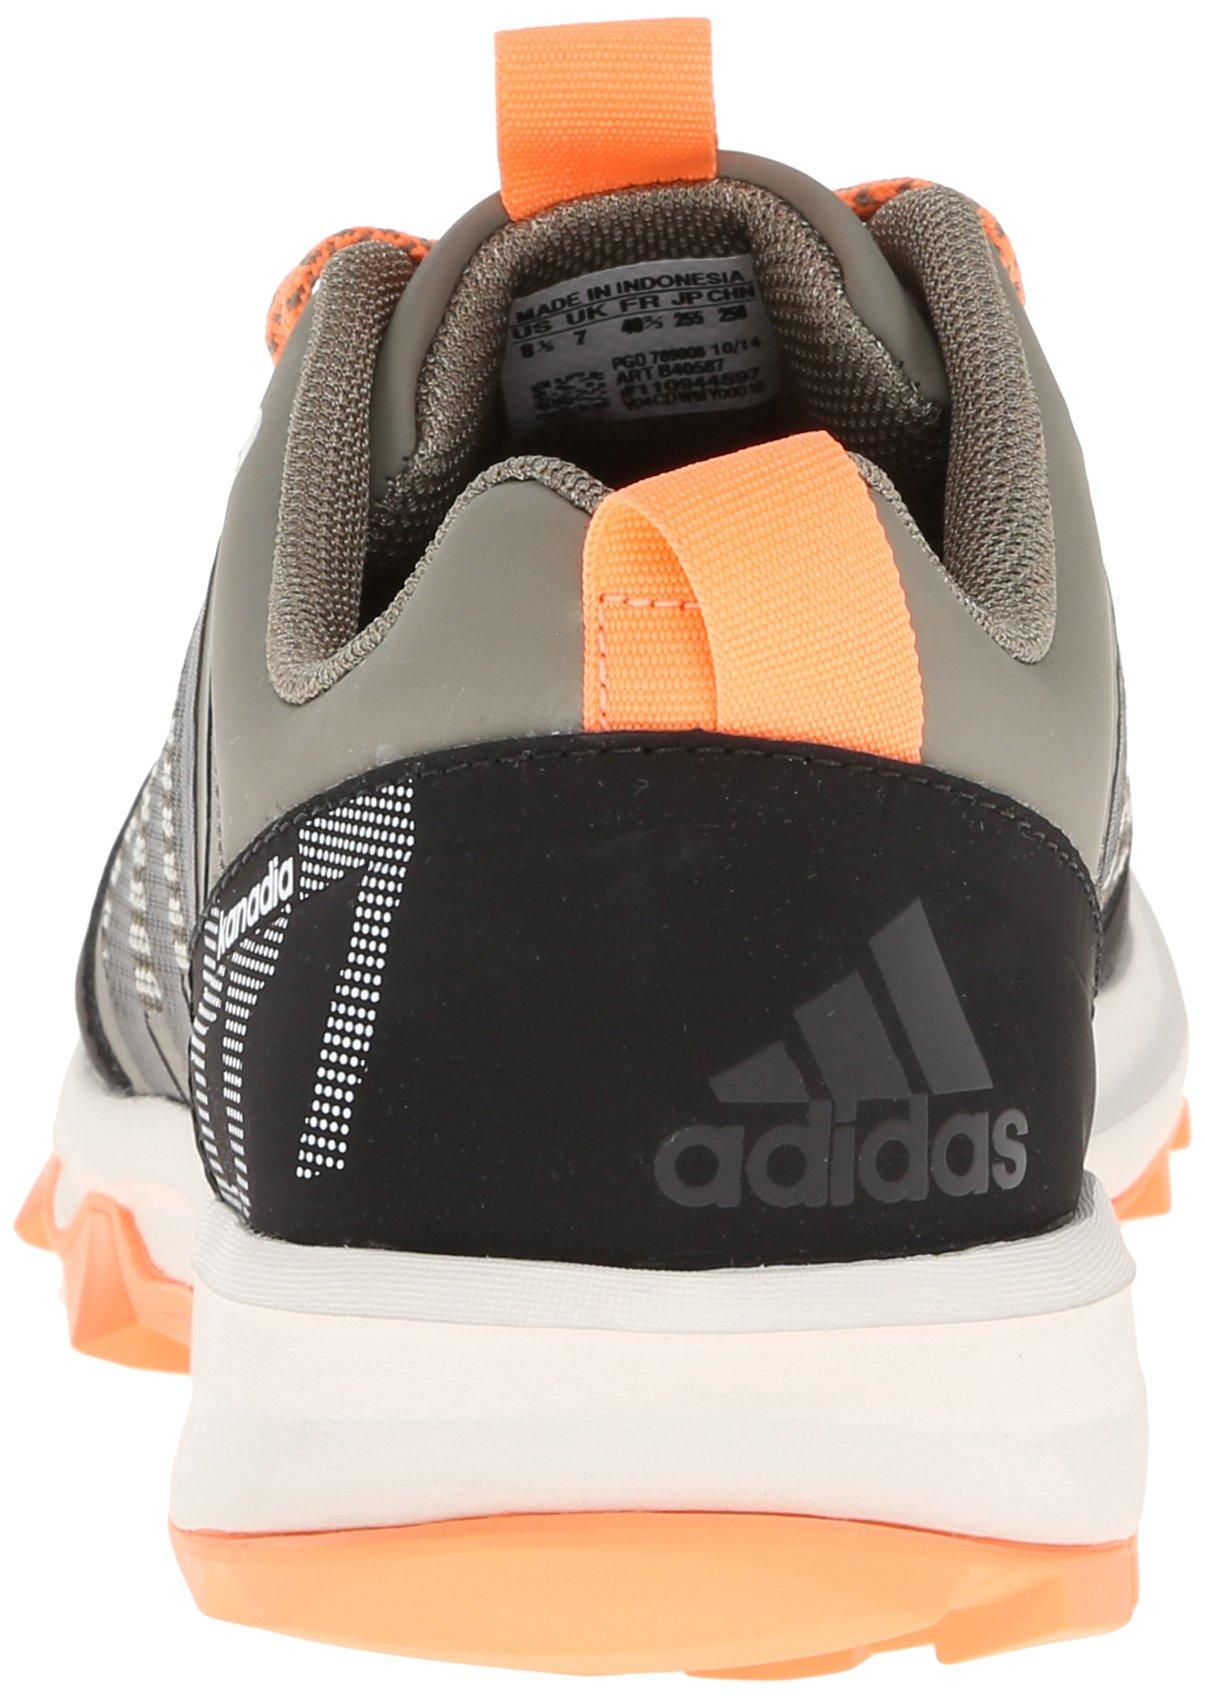 adidas Performance Women's Kanadia 7 TR W Trail Running Shoe, Clay/Chalk/Flash Orange, 7 M US by adidas (Image #2)